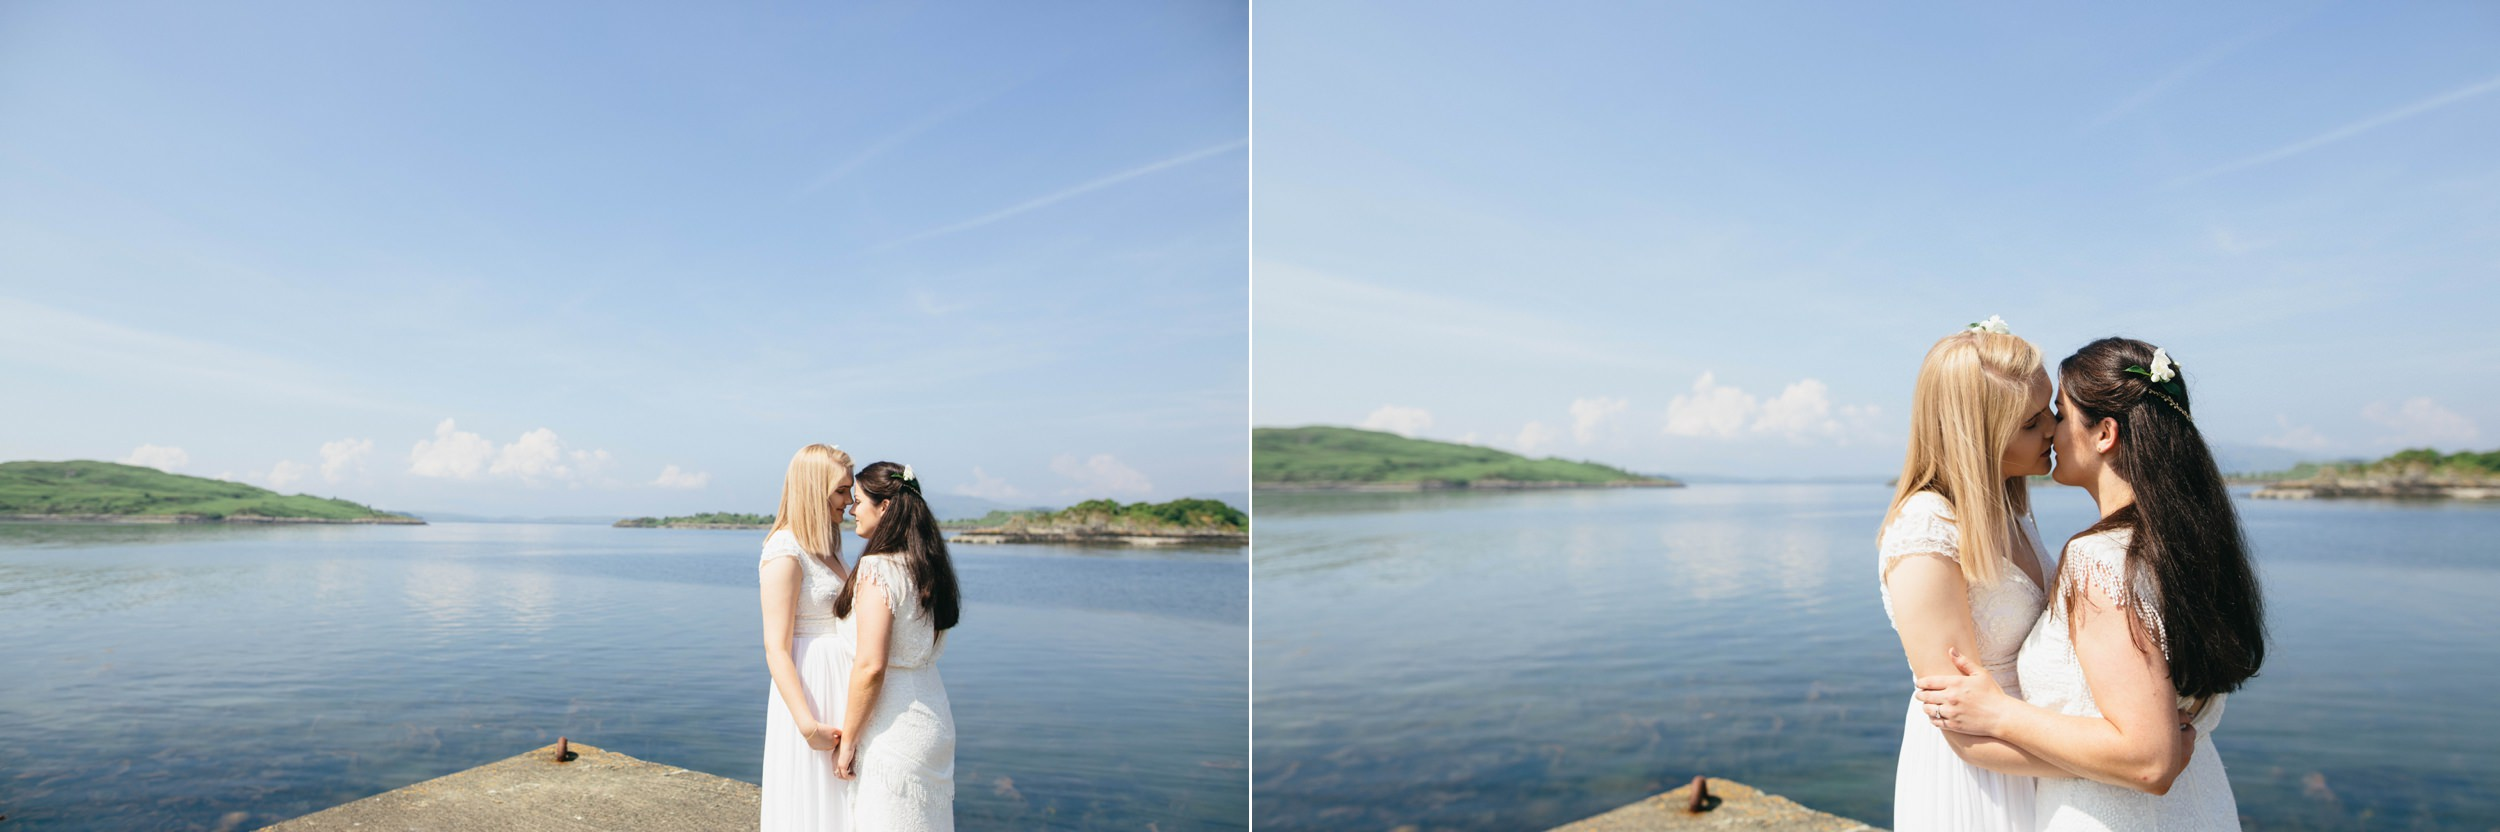 Quirky Wedding Photographer Scotland Glasgow Edinburgh Mirrorbox 094.jpg